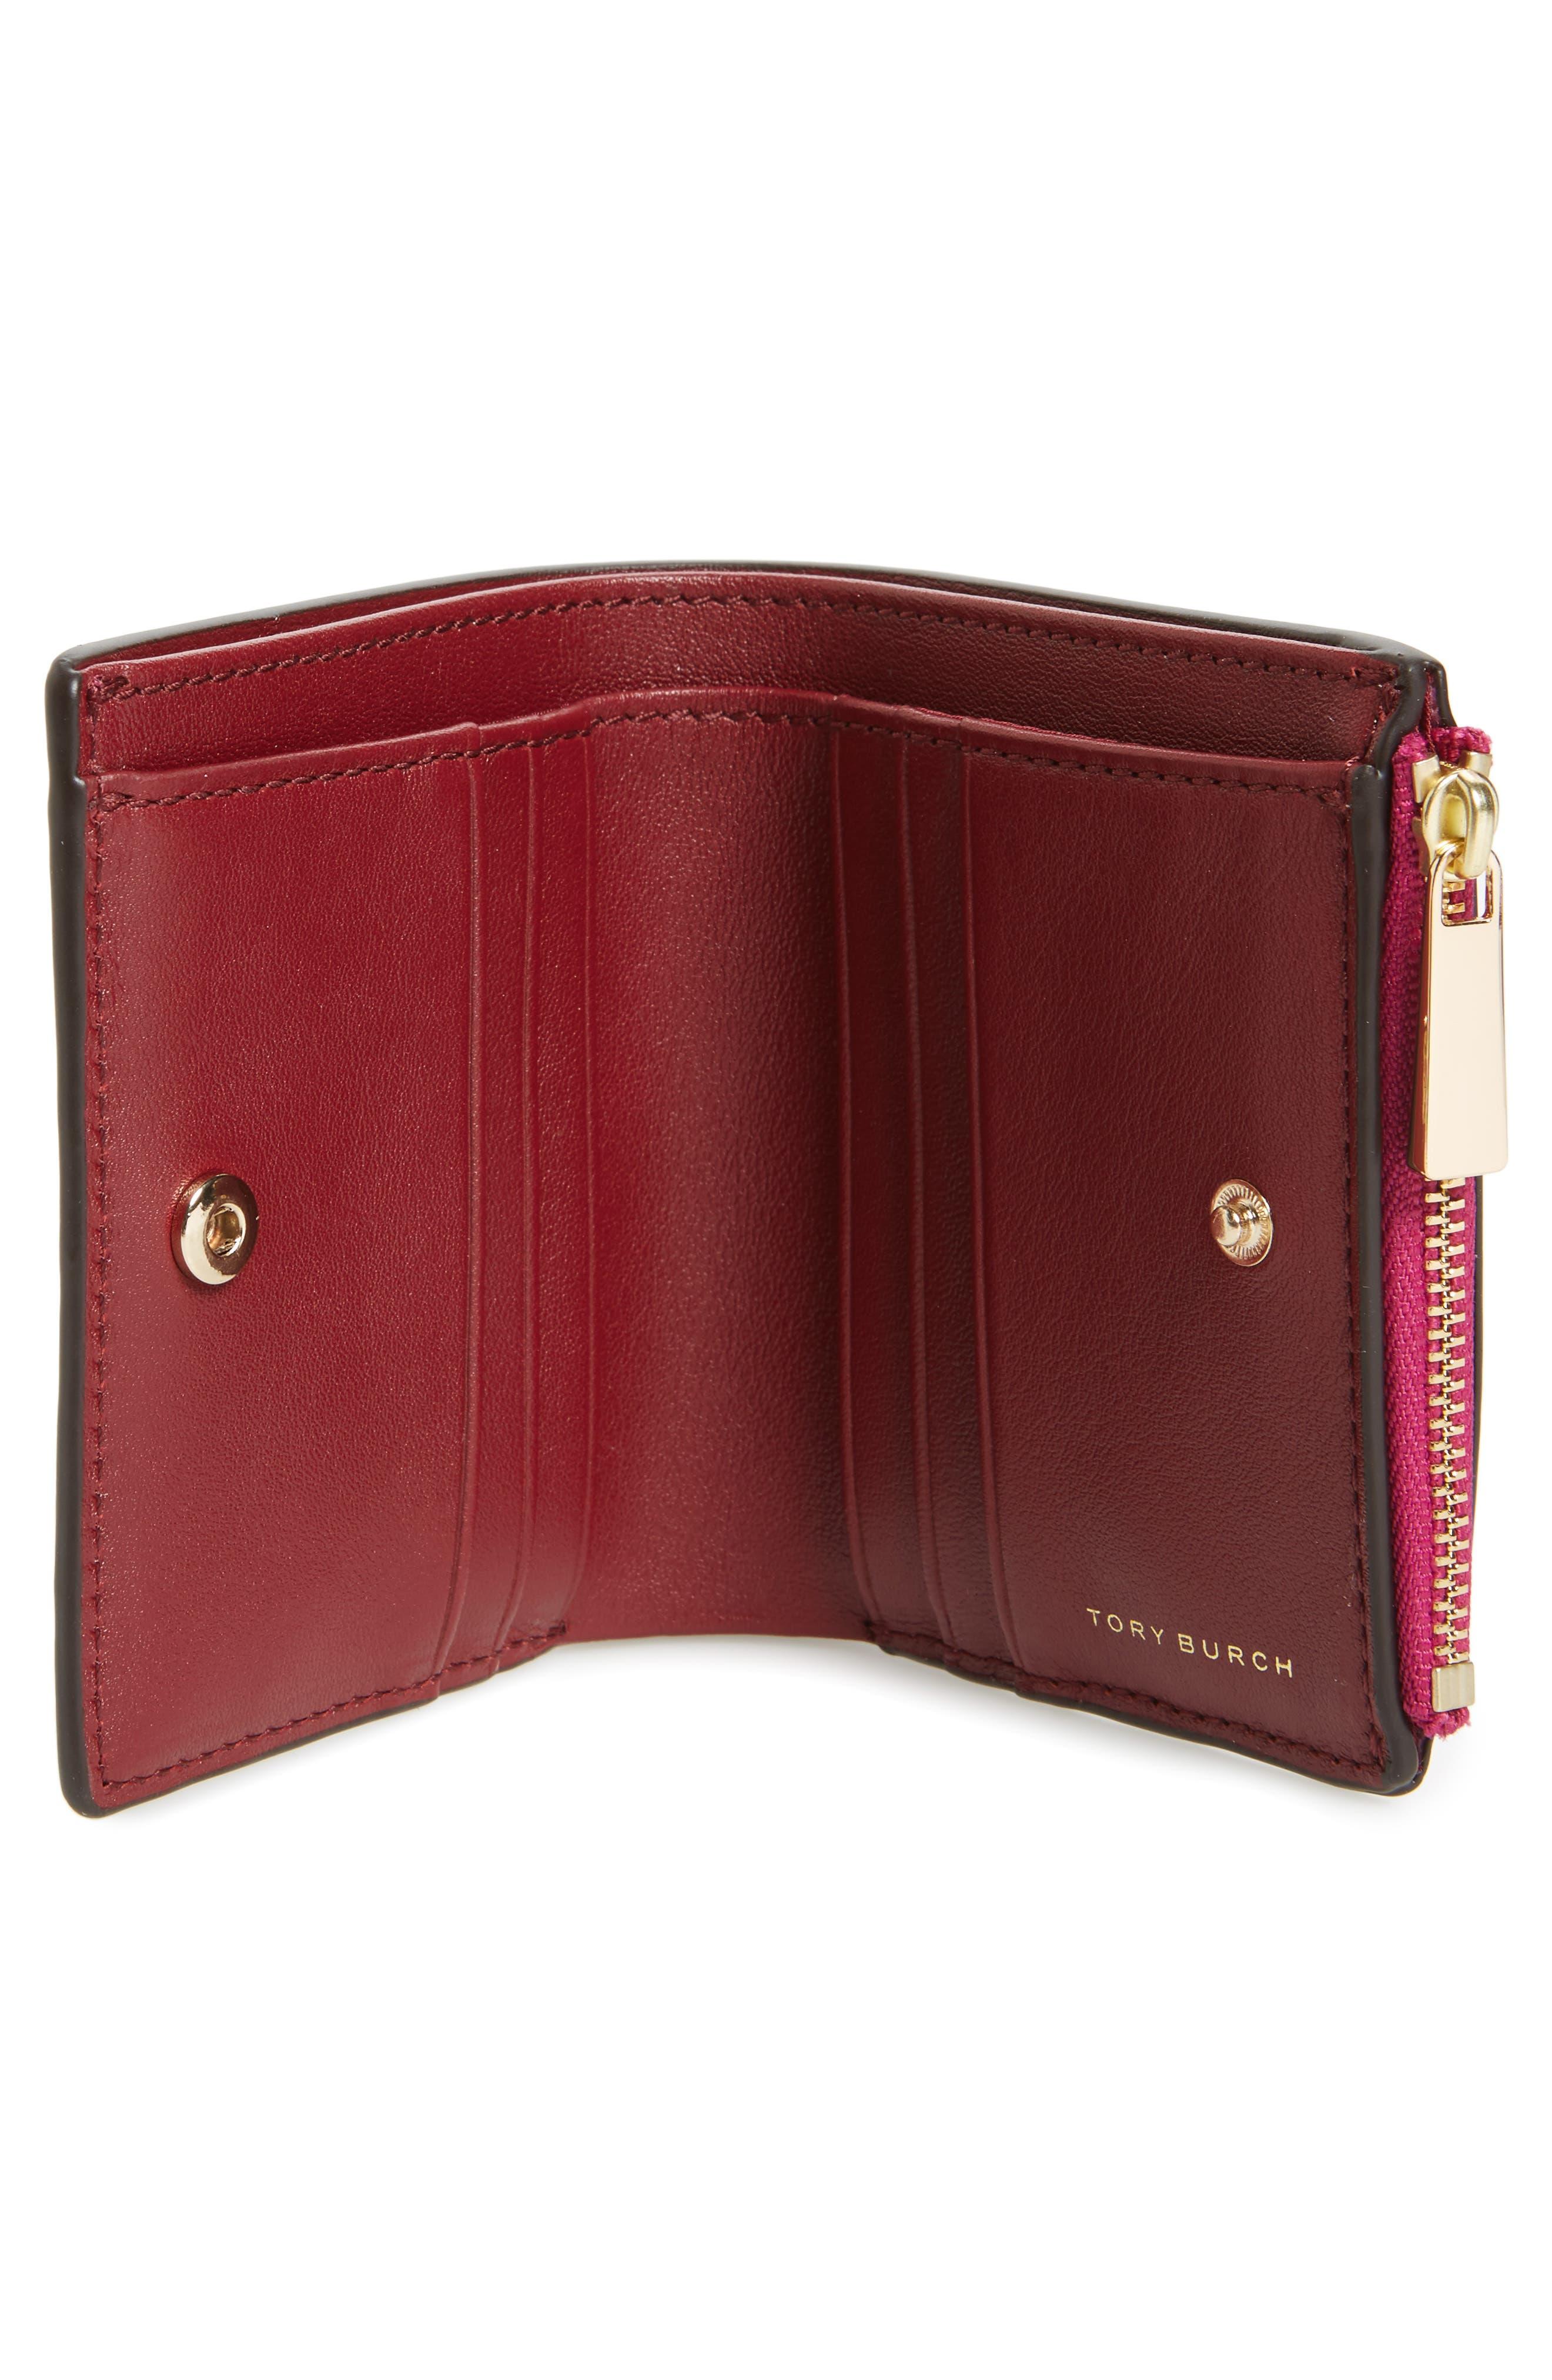 Mini Robinson Wallet Patent Leather Bifold Wallet,                             Alternate thumbnail 5, color,